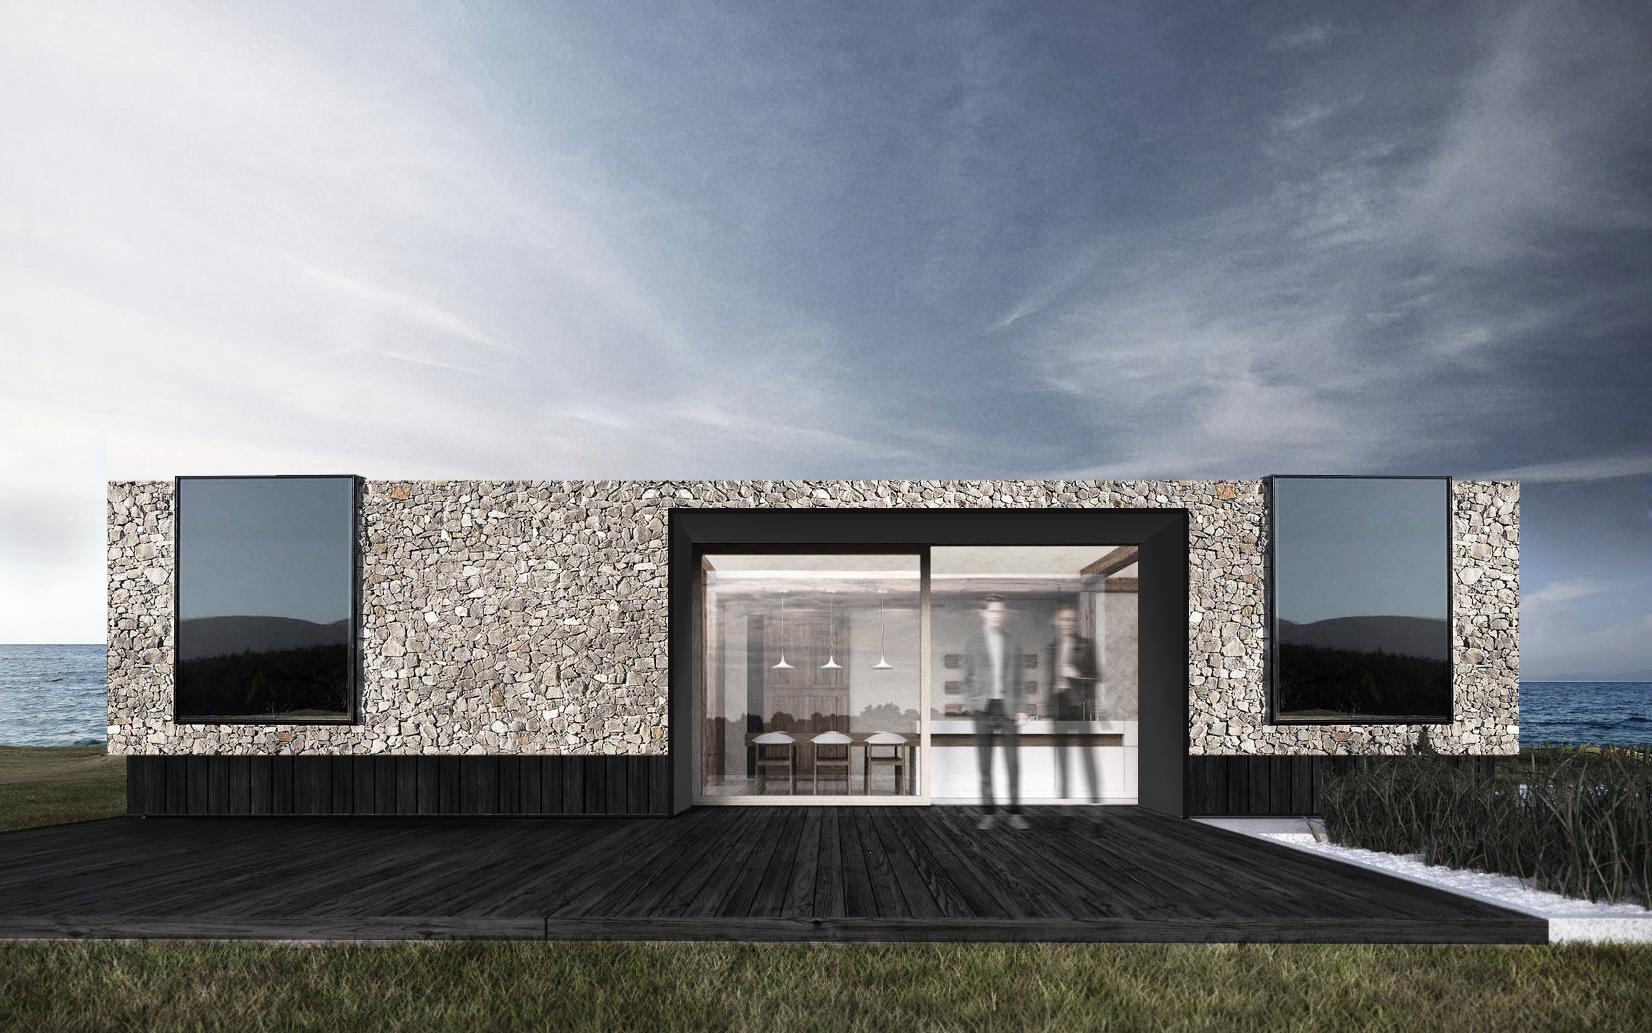 MHouse design 003 Sea